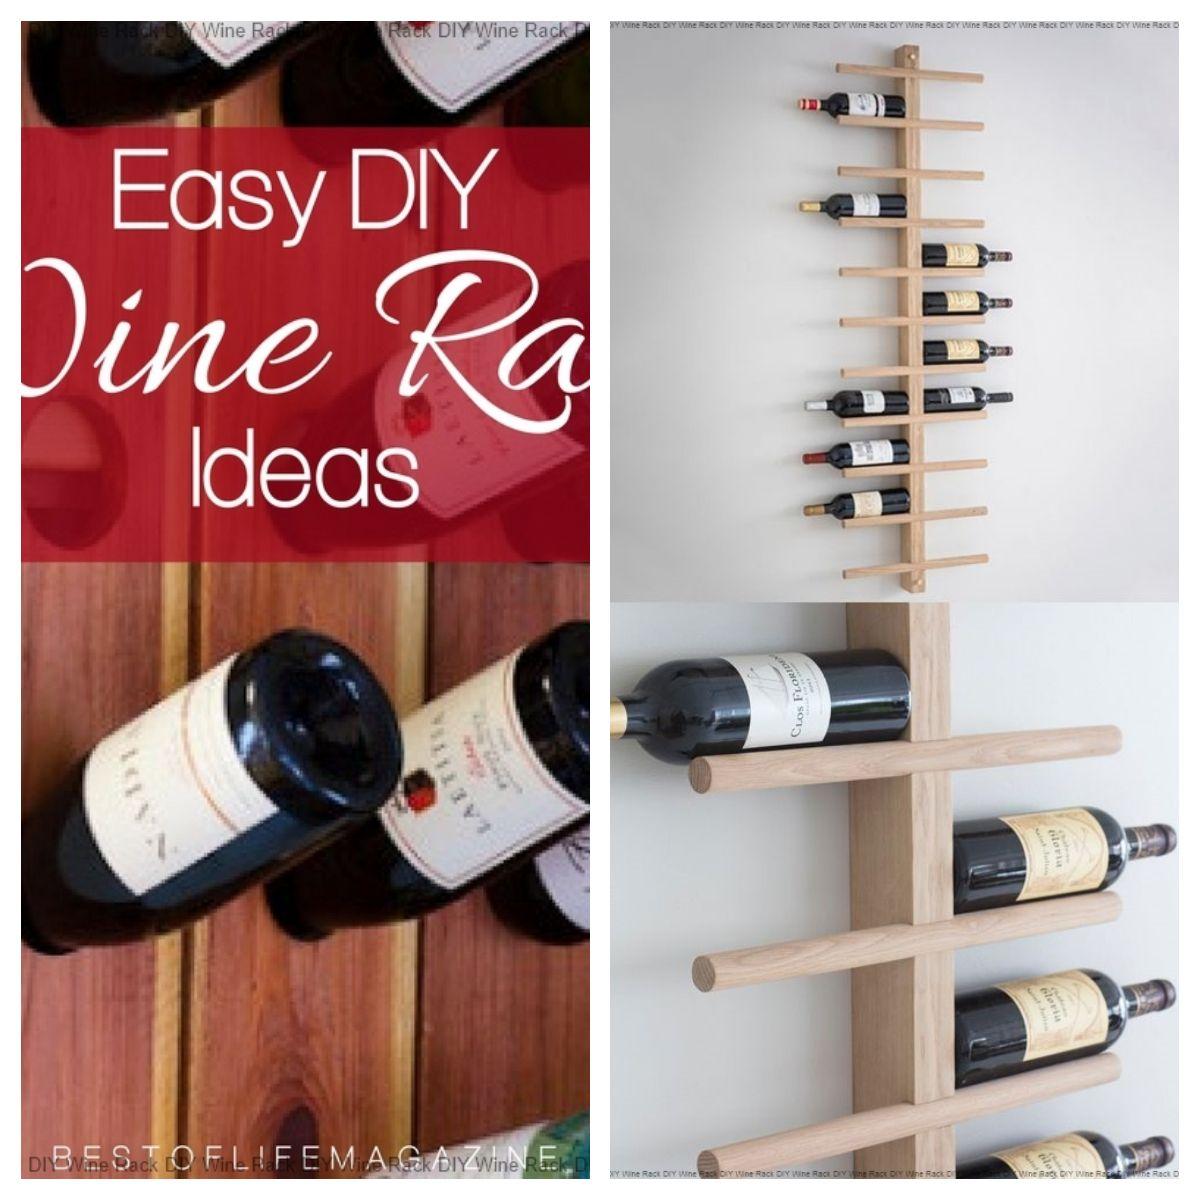 Pin On Diy Wine Rack